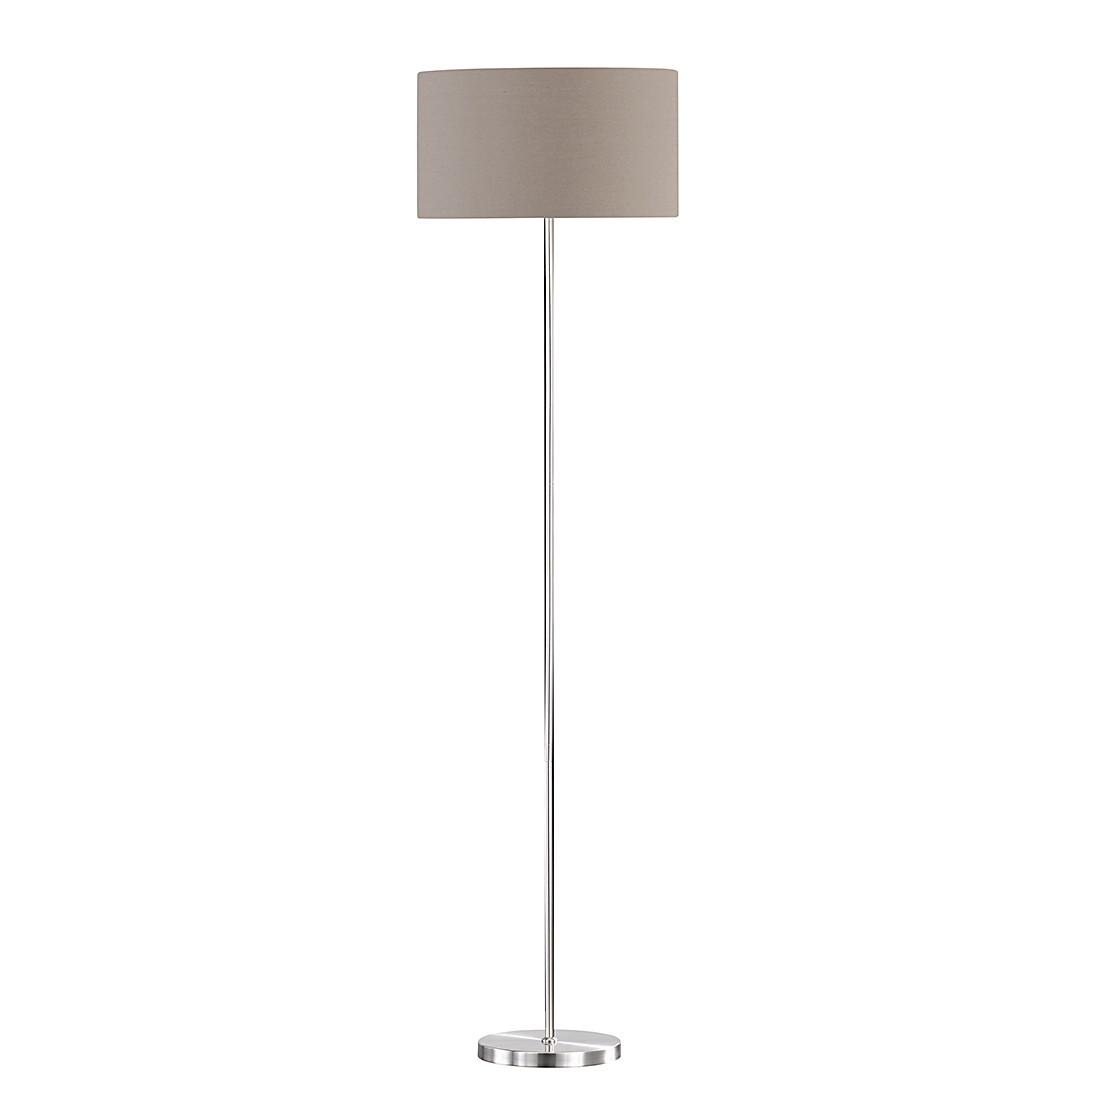 energie  A++, Staande lamp Loft - 1 lichtbron, Honsel